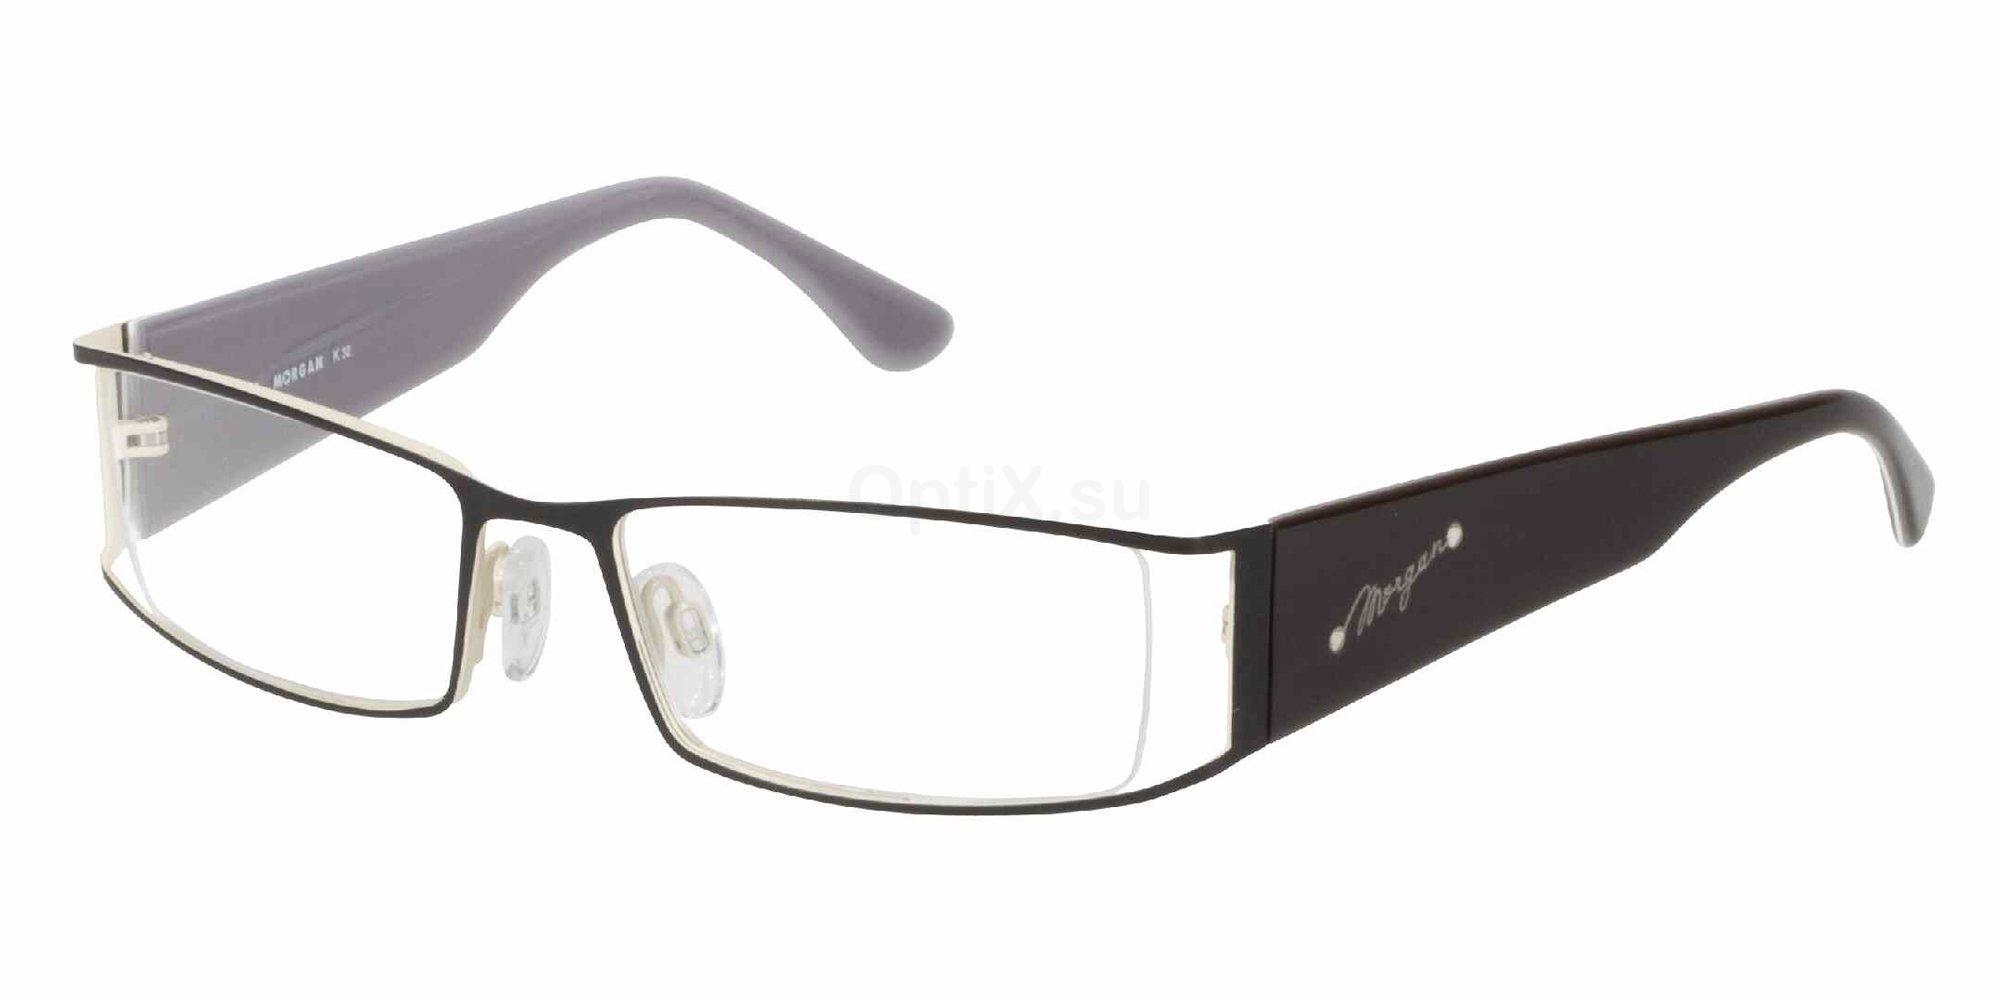 373 203104 , MORGAN Eyewear